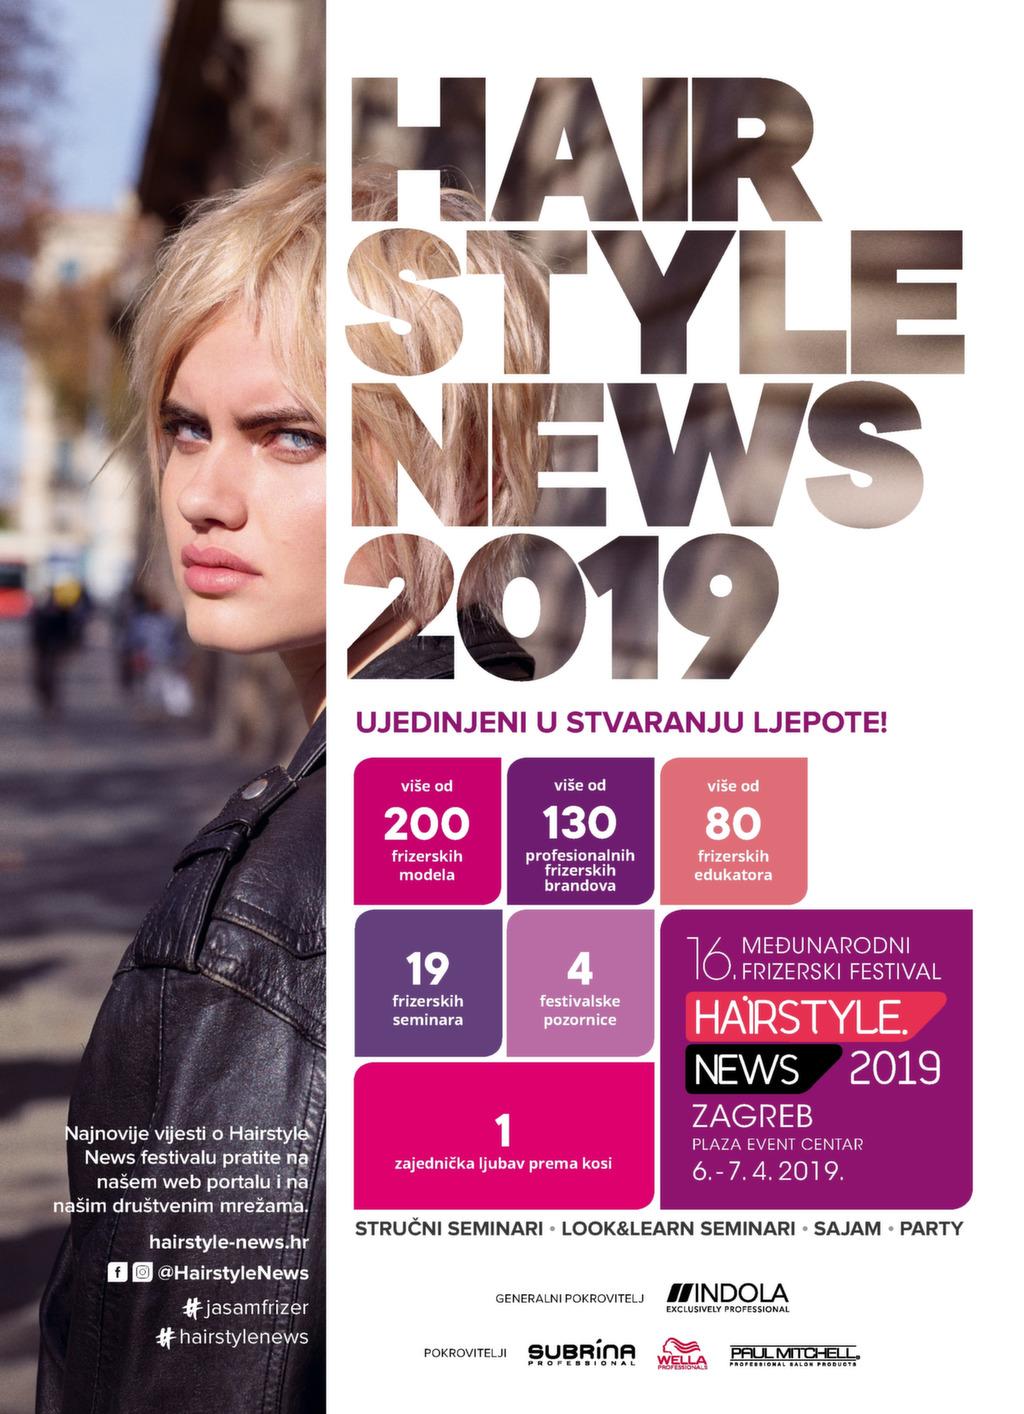 PROGRAM 17. HAIRSTYLE NEWS FESTIVALA – Hairstyle News Festival